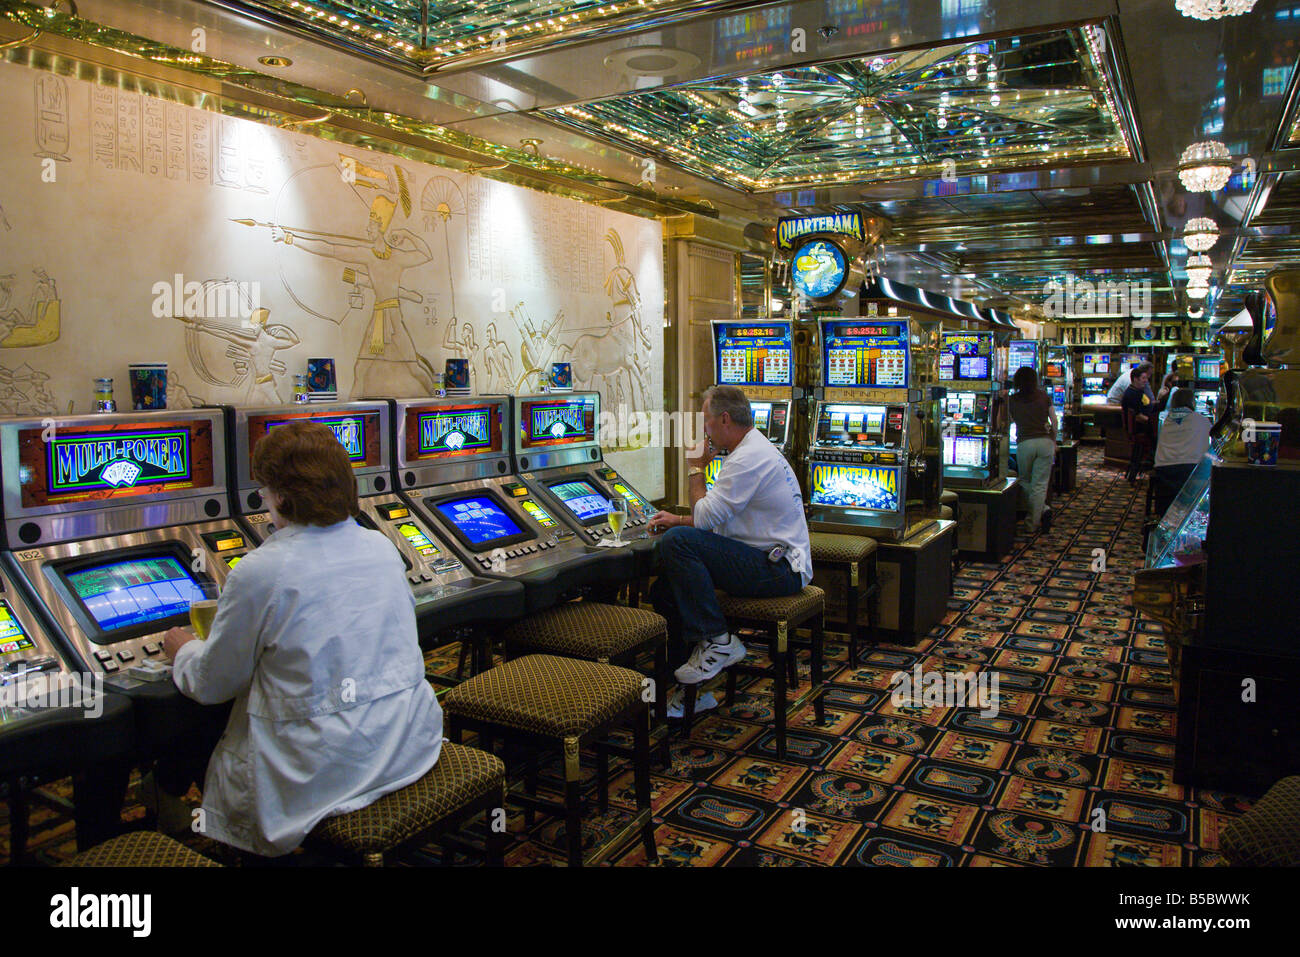 casino payouts on cruise ships